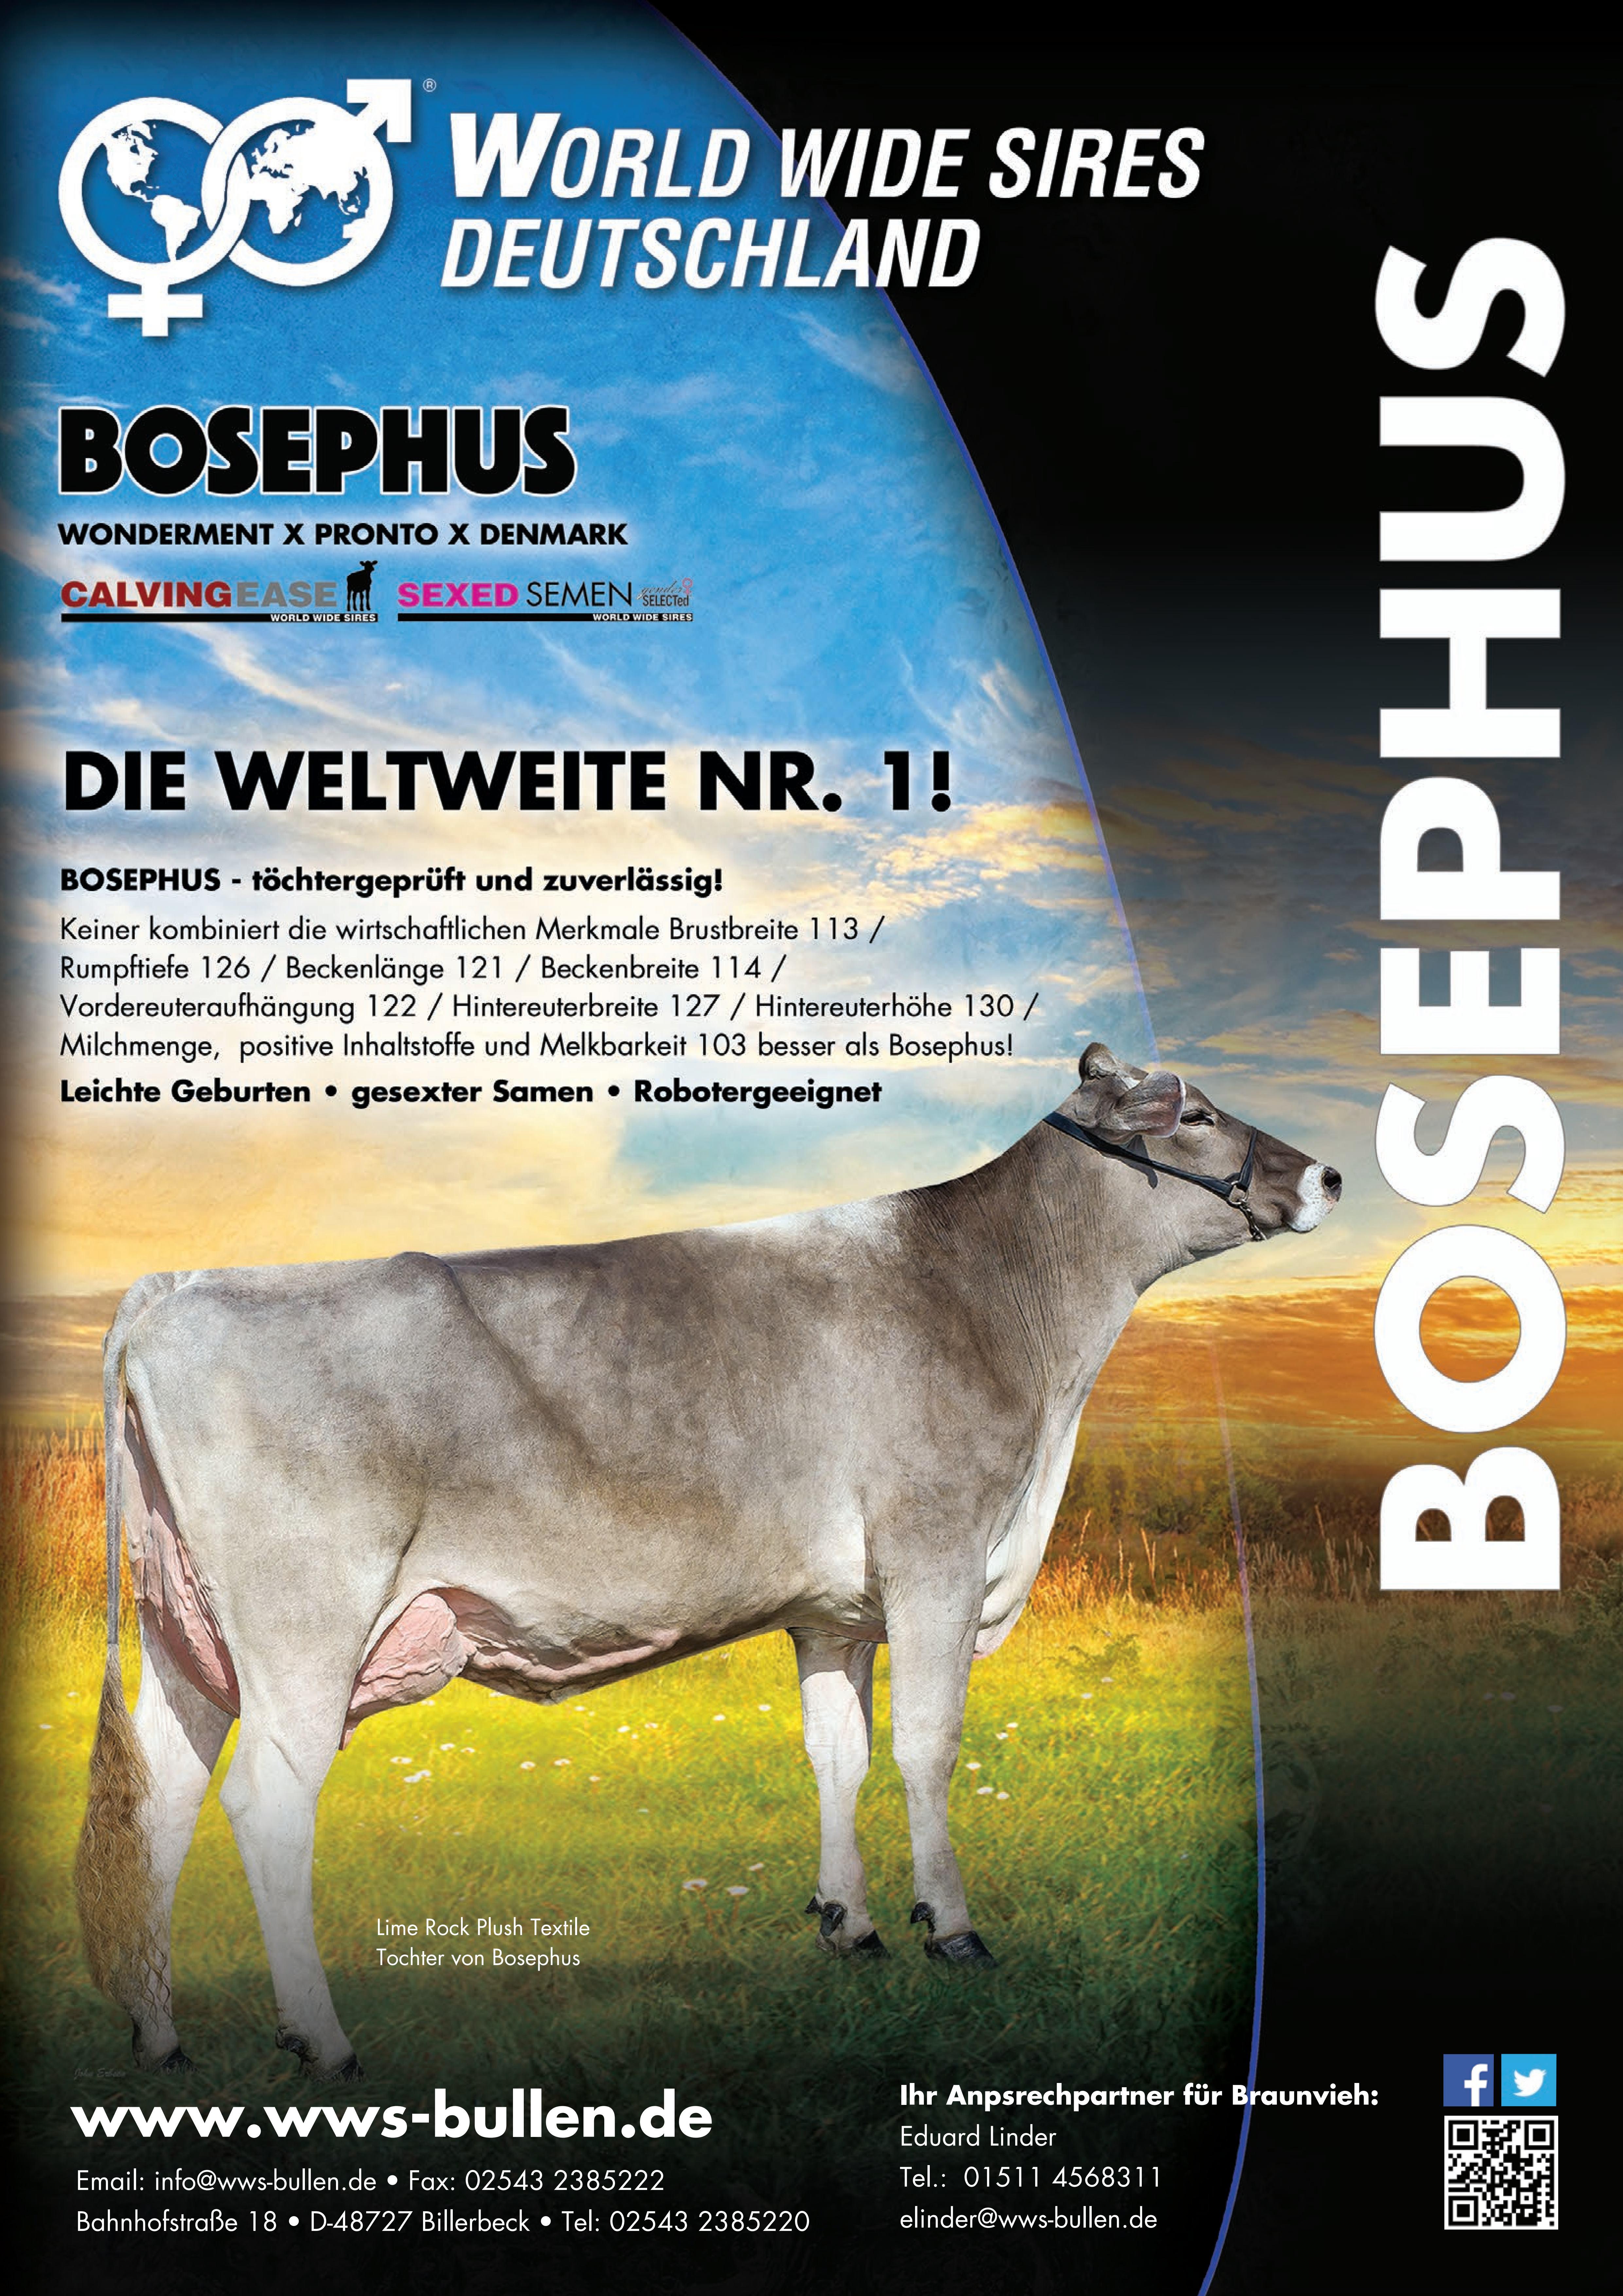 Bosephus - die weltweite Nr. 1!